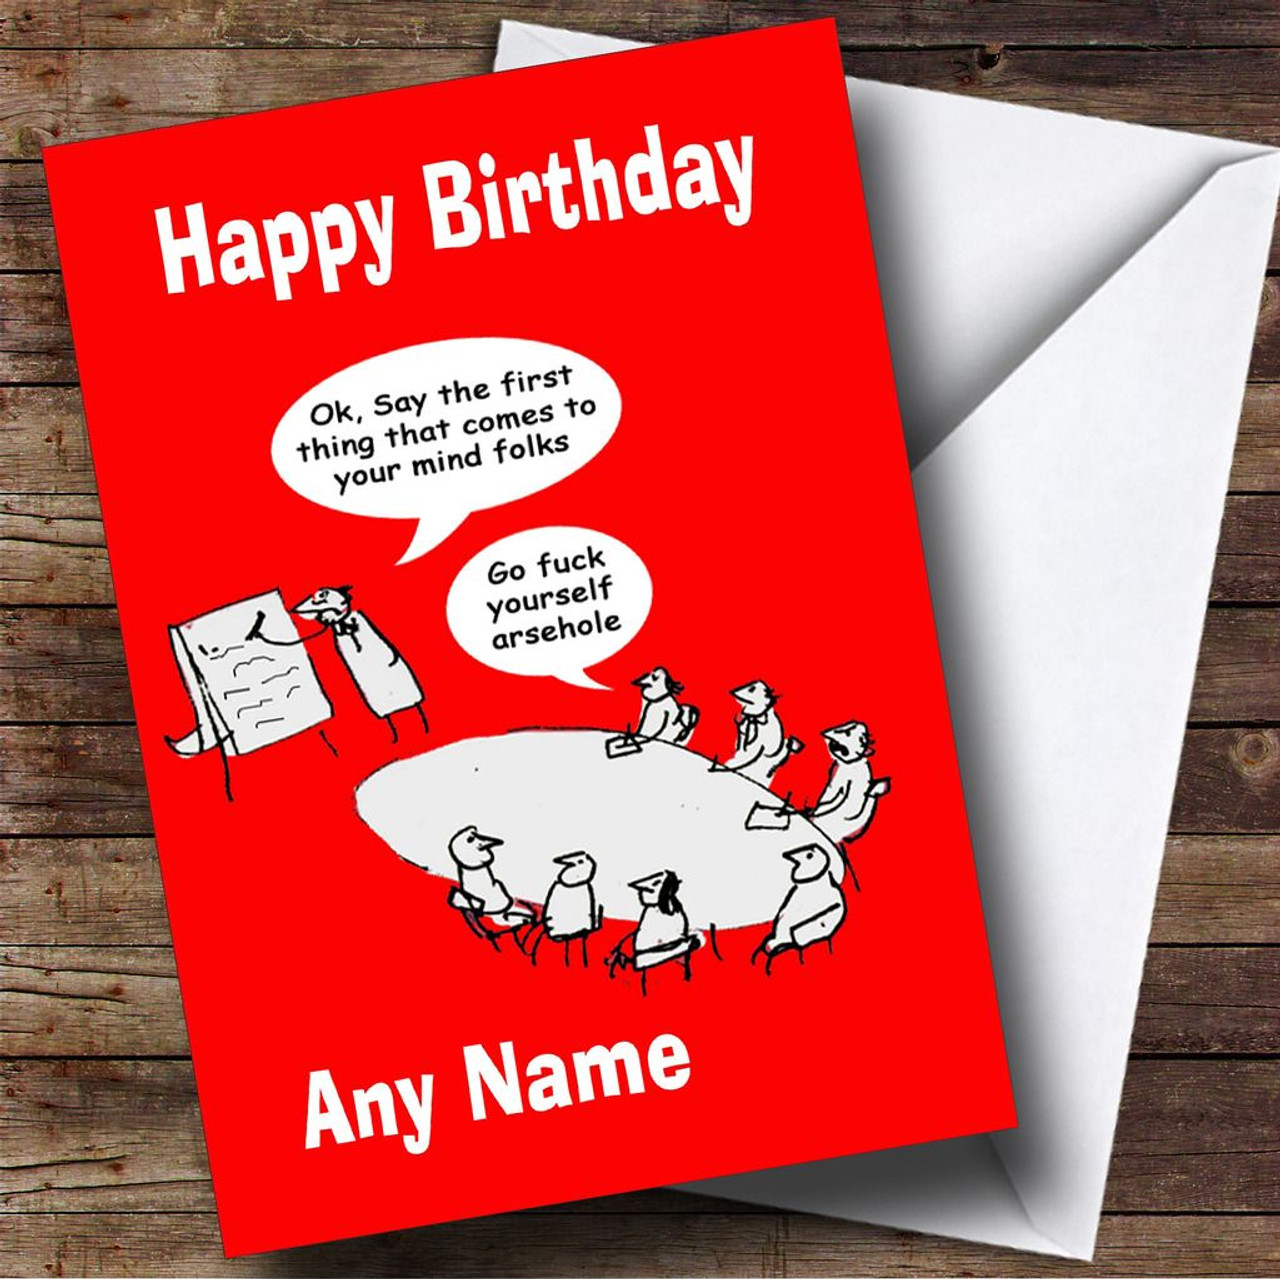 Funny Insulting Joke Personalised Birthday Card